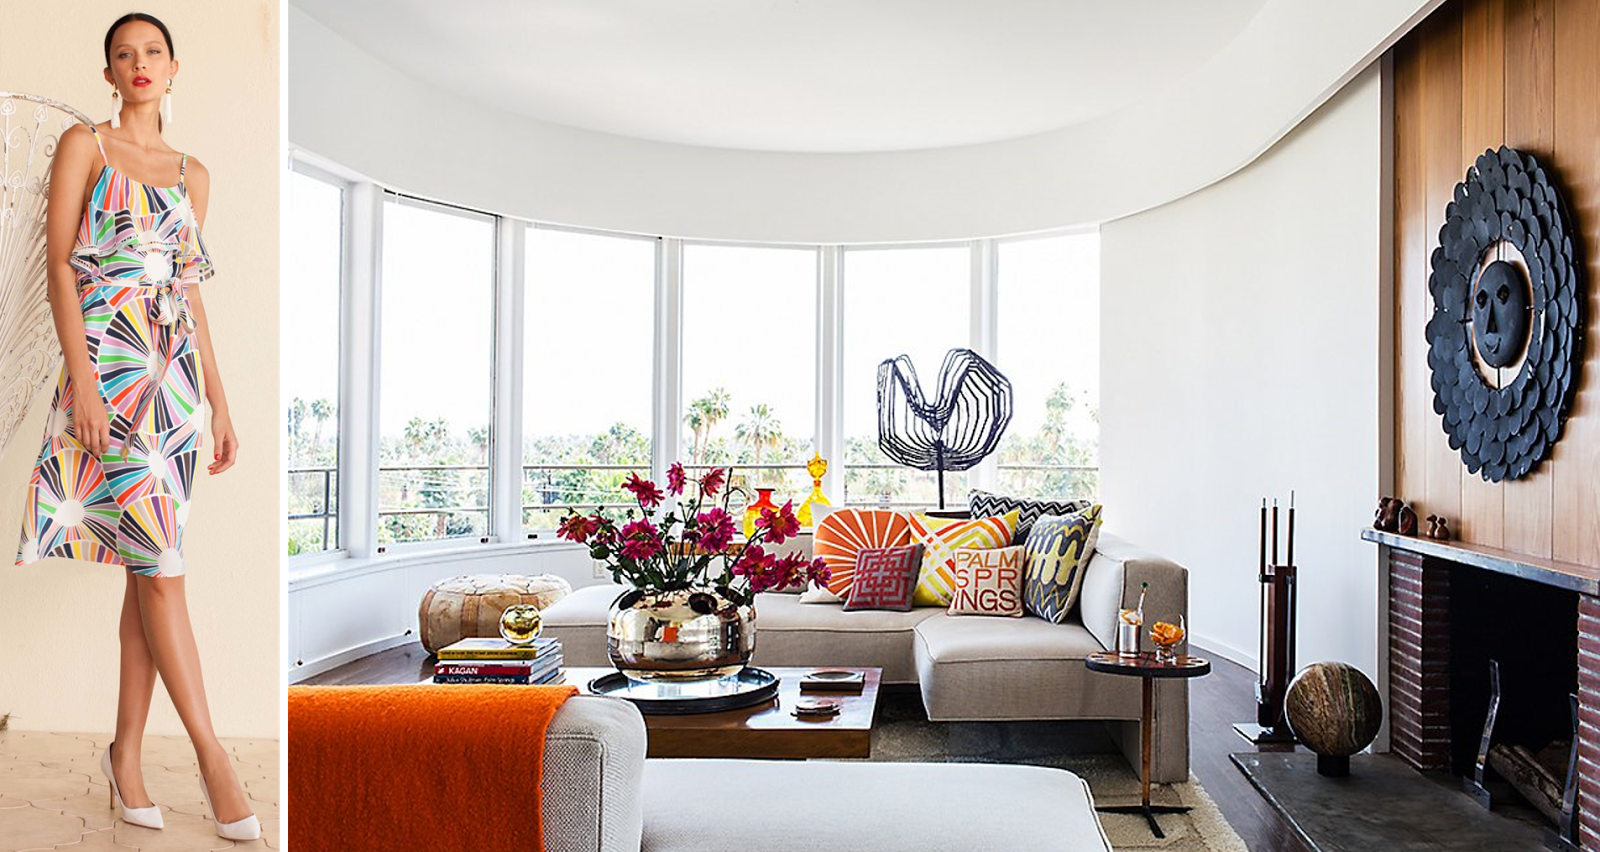 fashion designers homes. BoHoHome Com  Bohosusan 2 Fashion Designers Homes Pair With Their New York Week